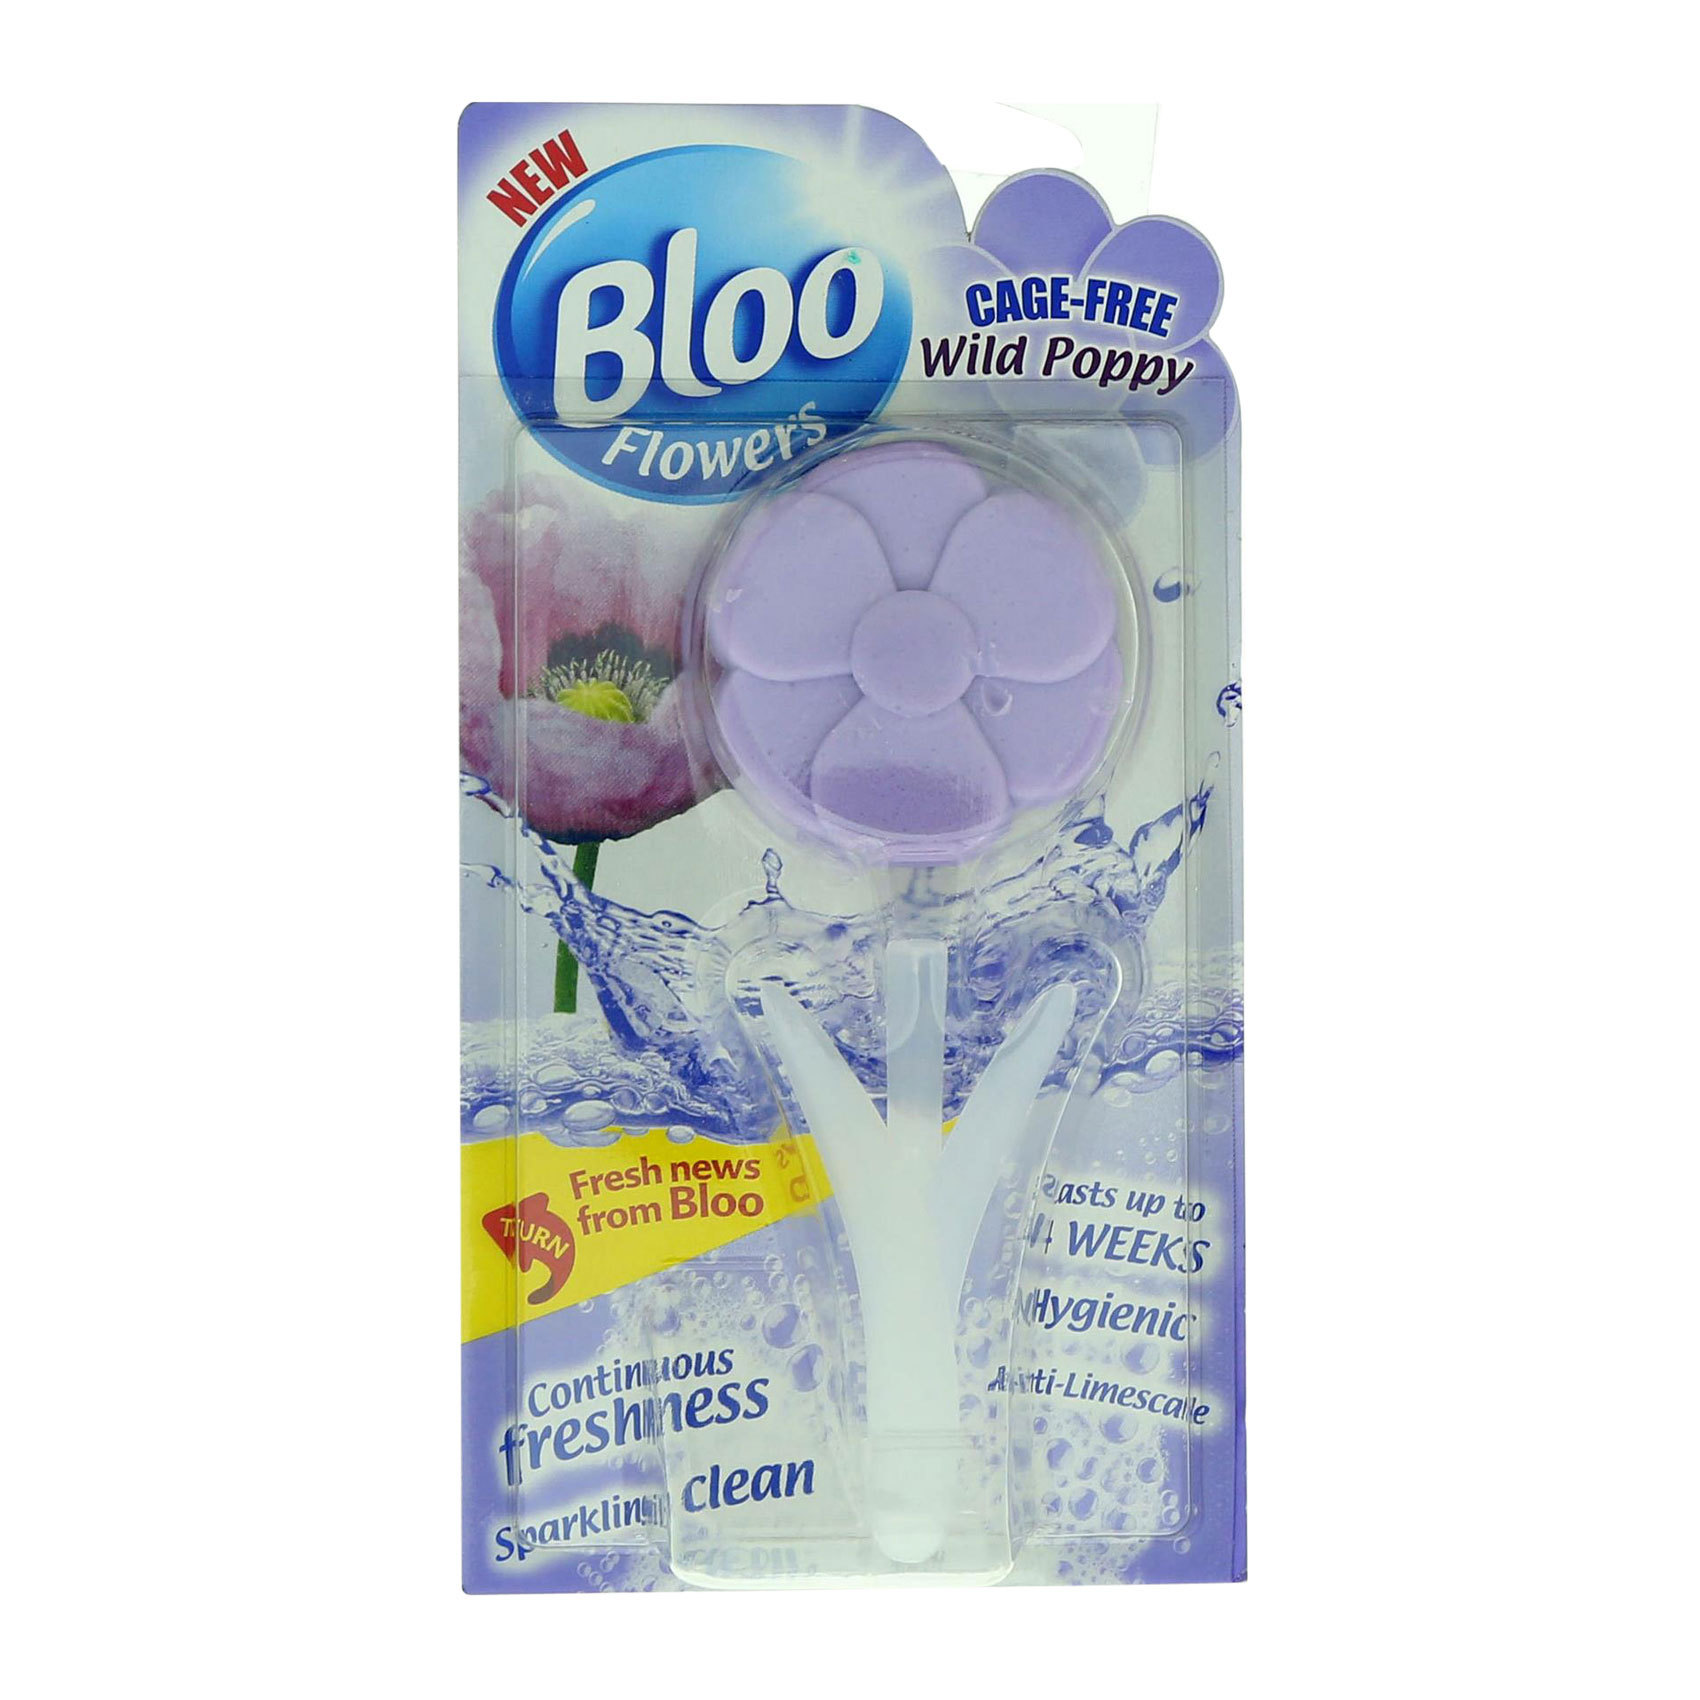 BLOO CAGELESS RIM WILD POPPY 34G